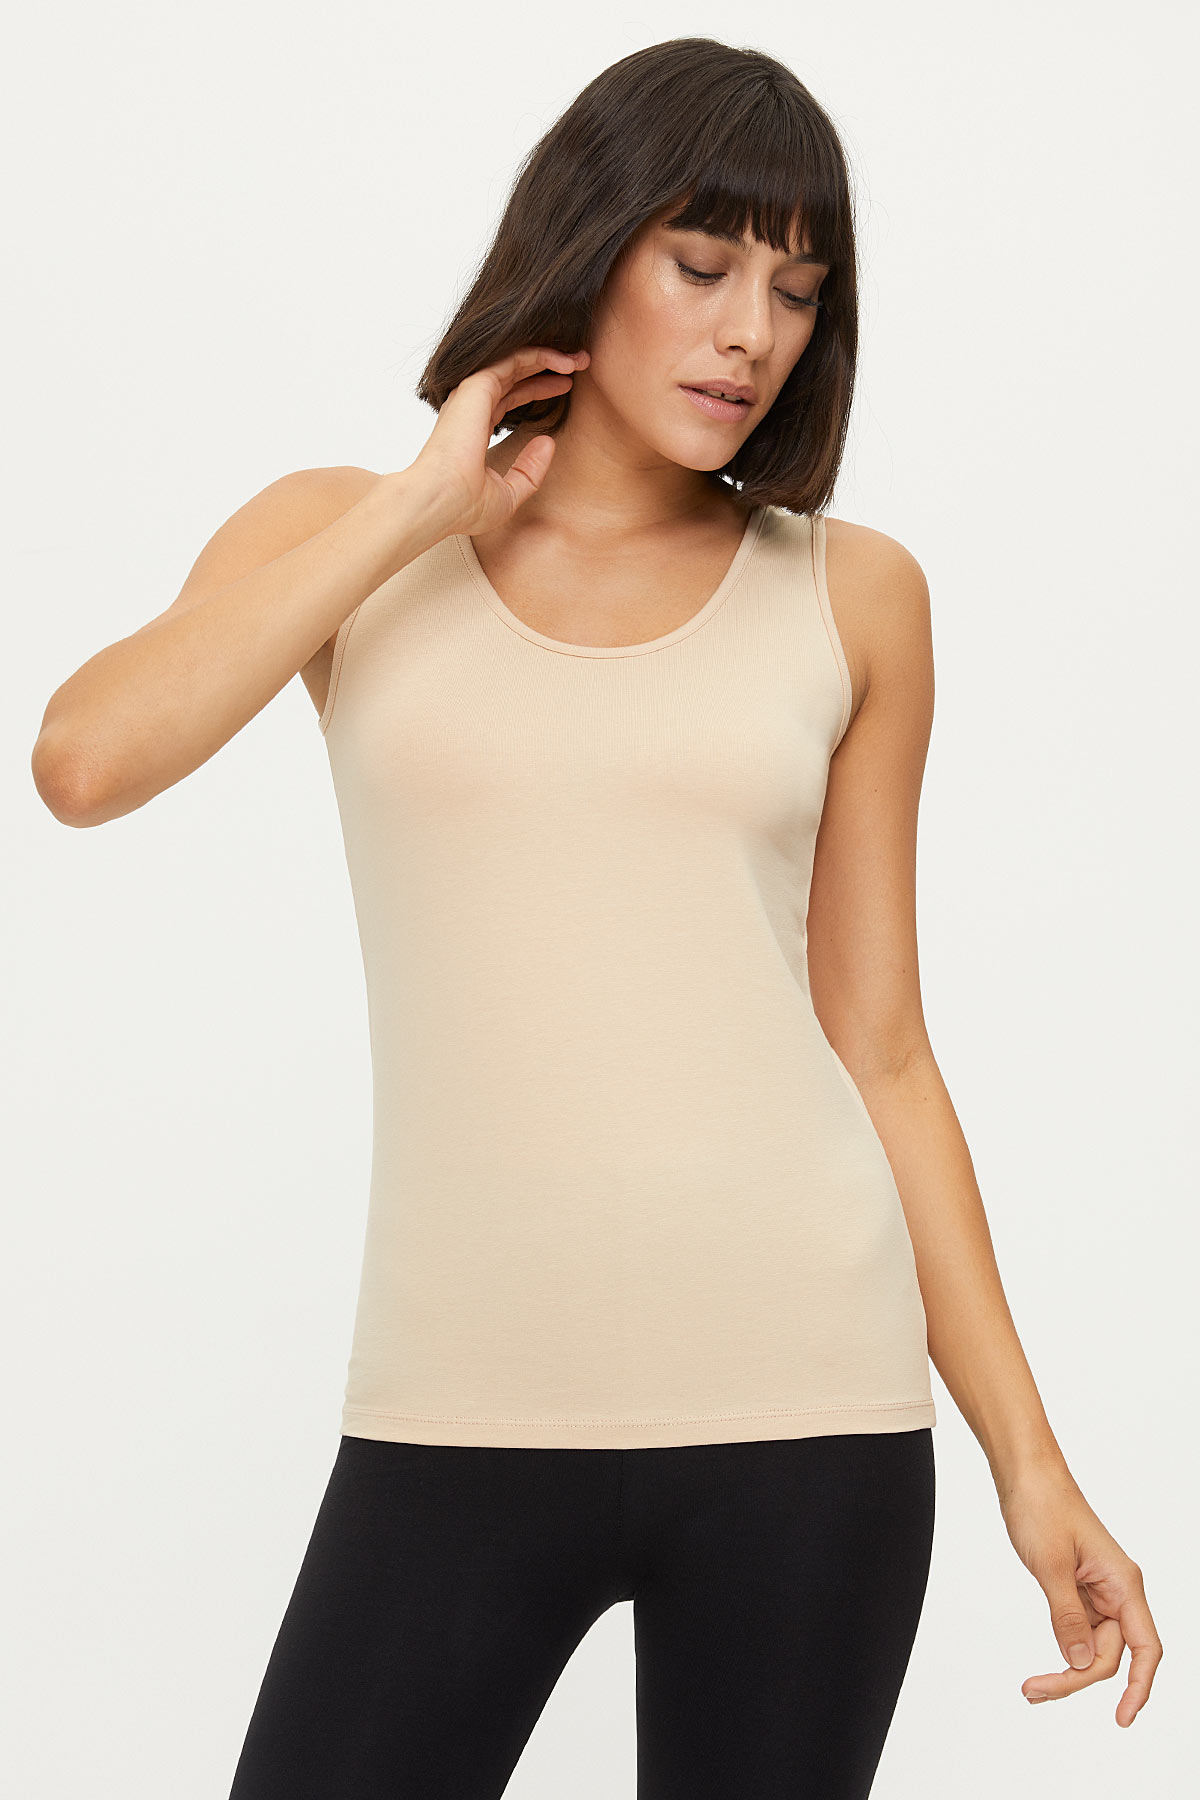 Bross - 1247 Lycra Wide Strappy Women's Undershirt